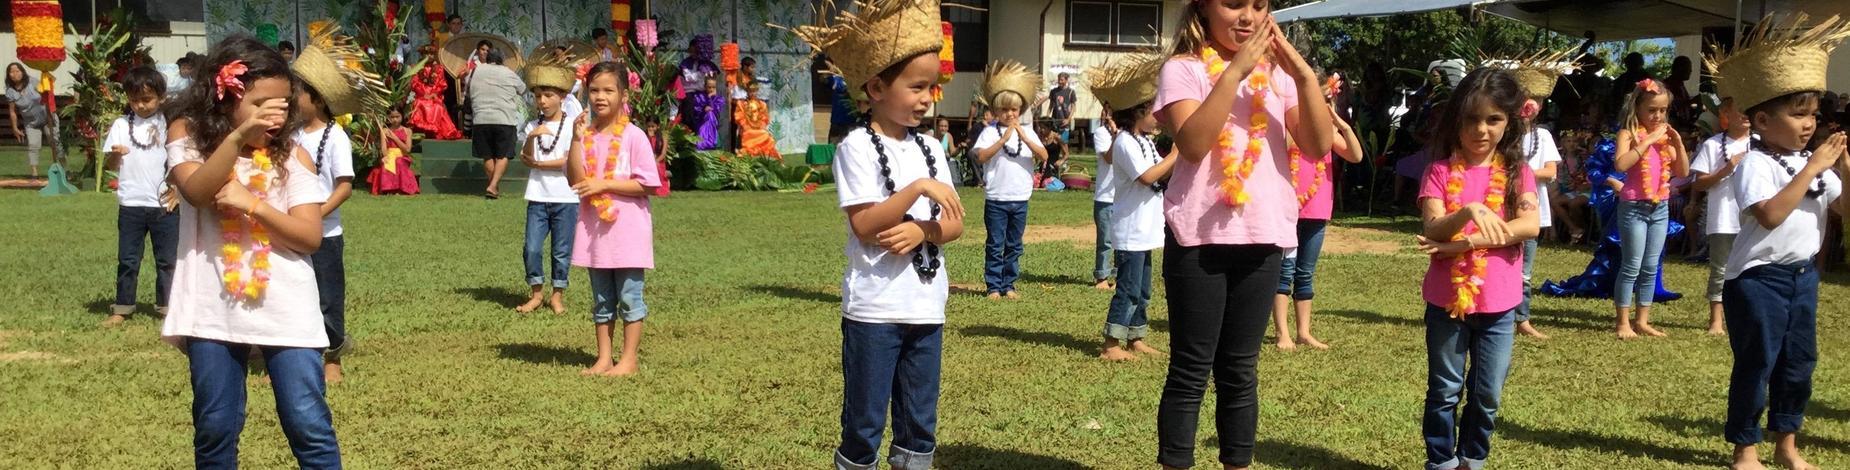 Kindergarten class dance.